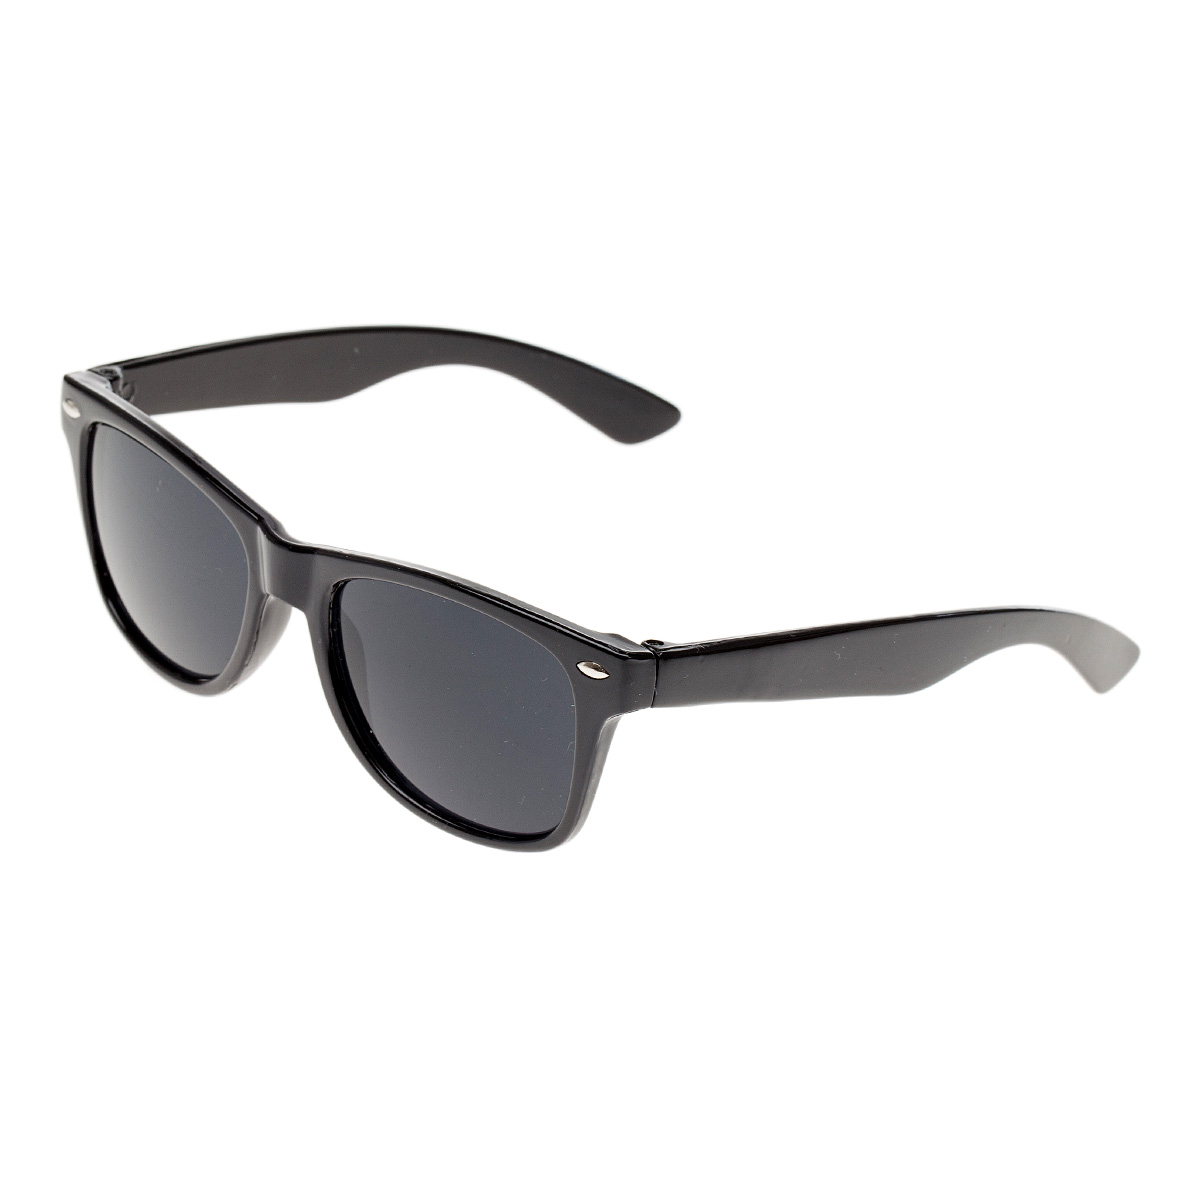 Фото - Очки солнцезащитные Sevenext, 23032-55 очки солнцезащитные sevenext 23032 28